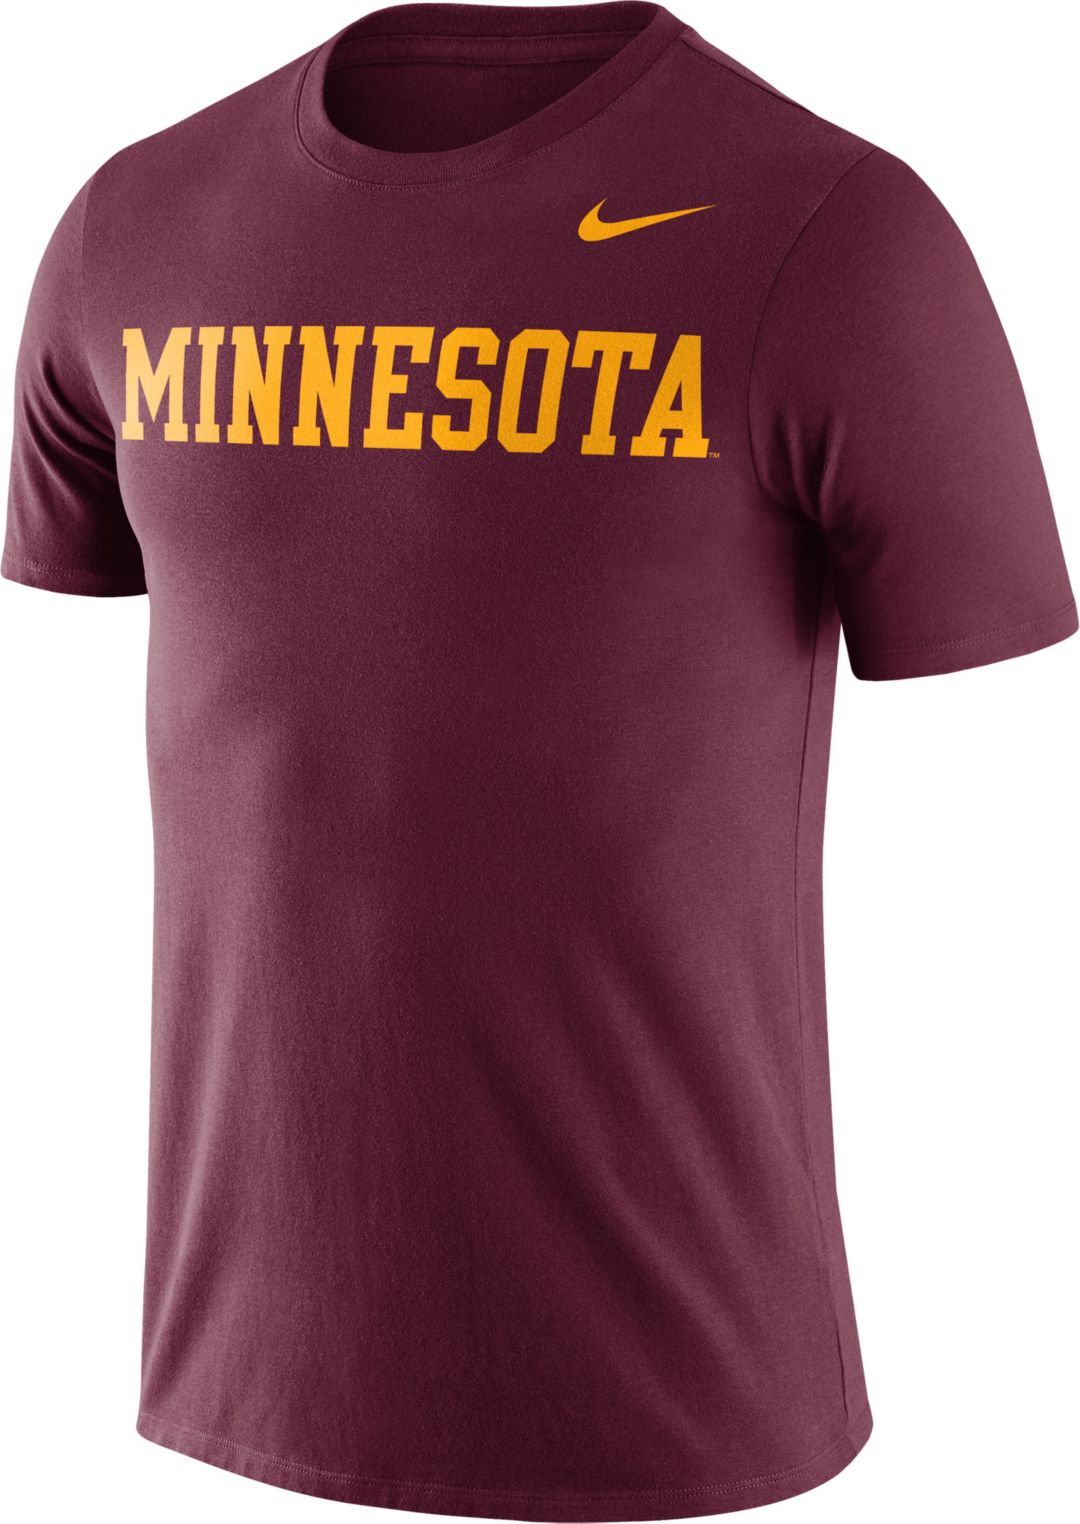 separation shoes 71552 7e51f Nike Men's Minnesota Golden Gophers Maroon Dri-FIT Cotton Word T-Shirt